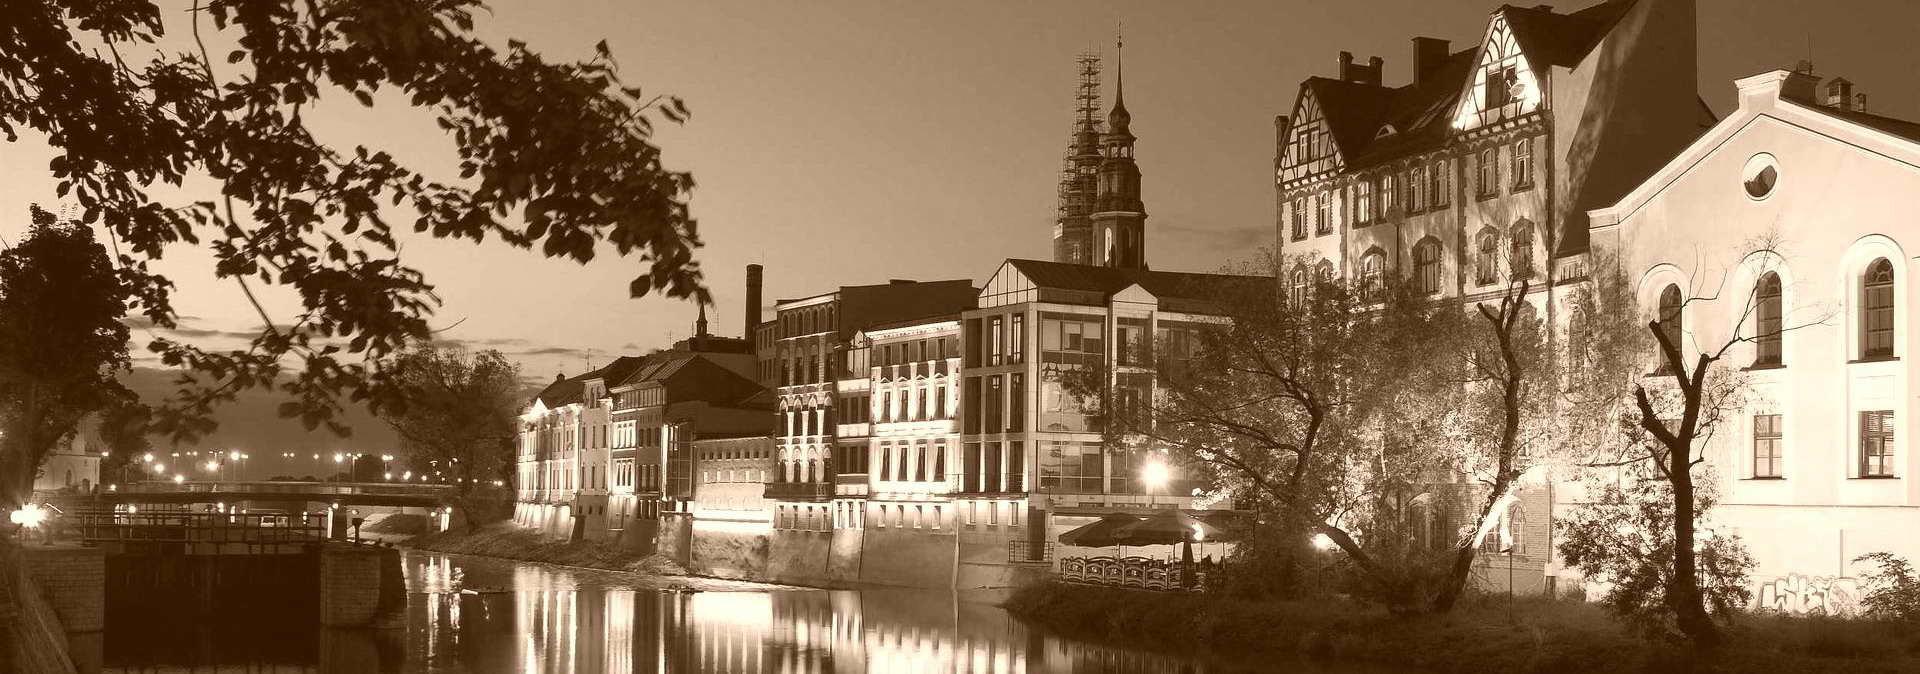 kancelaria adwokacka Opole